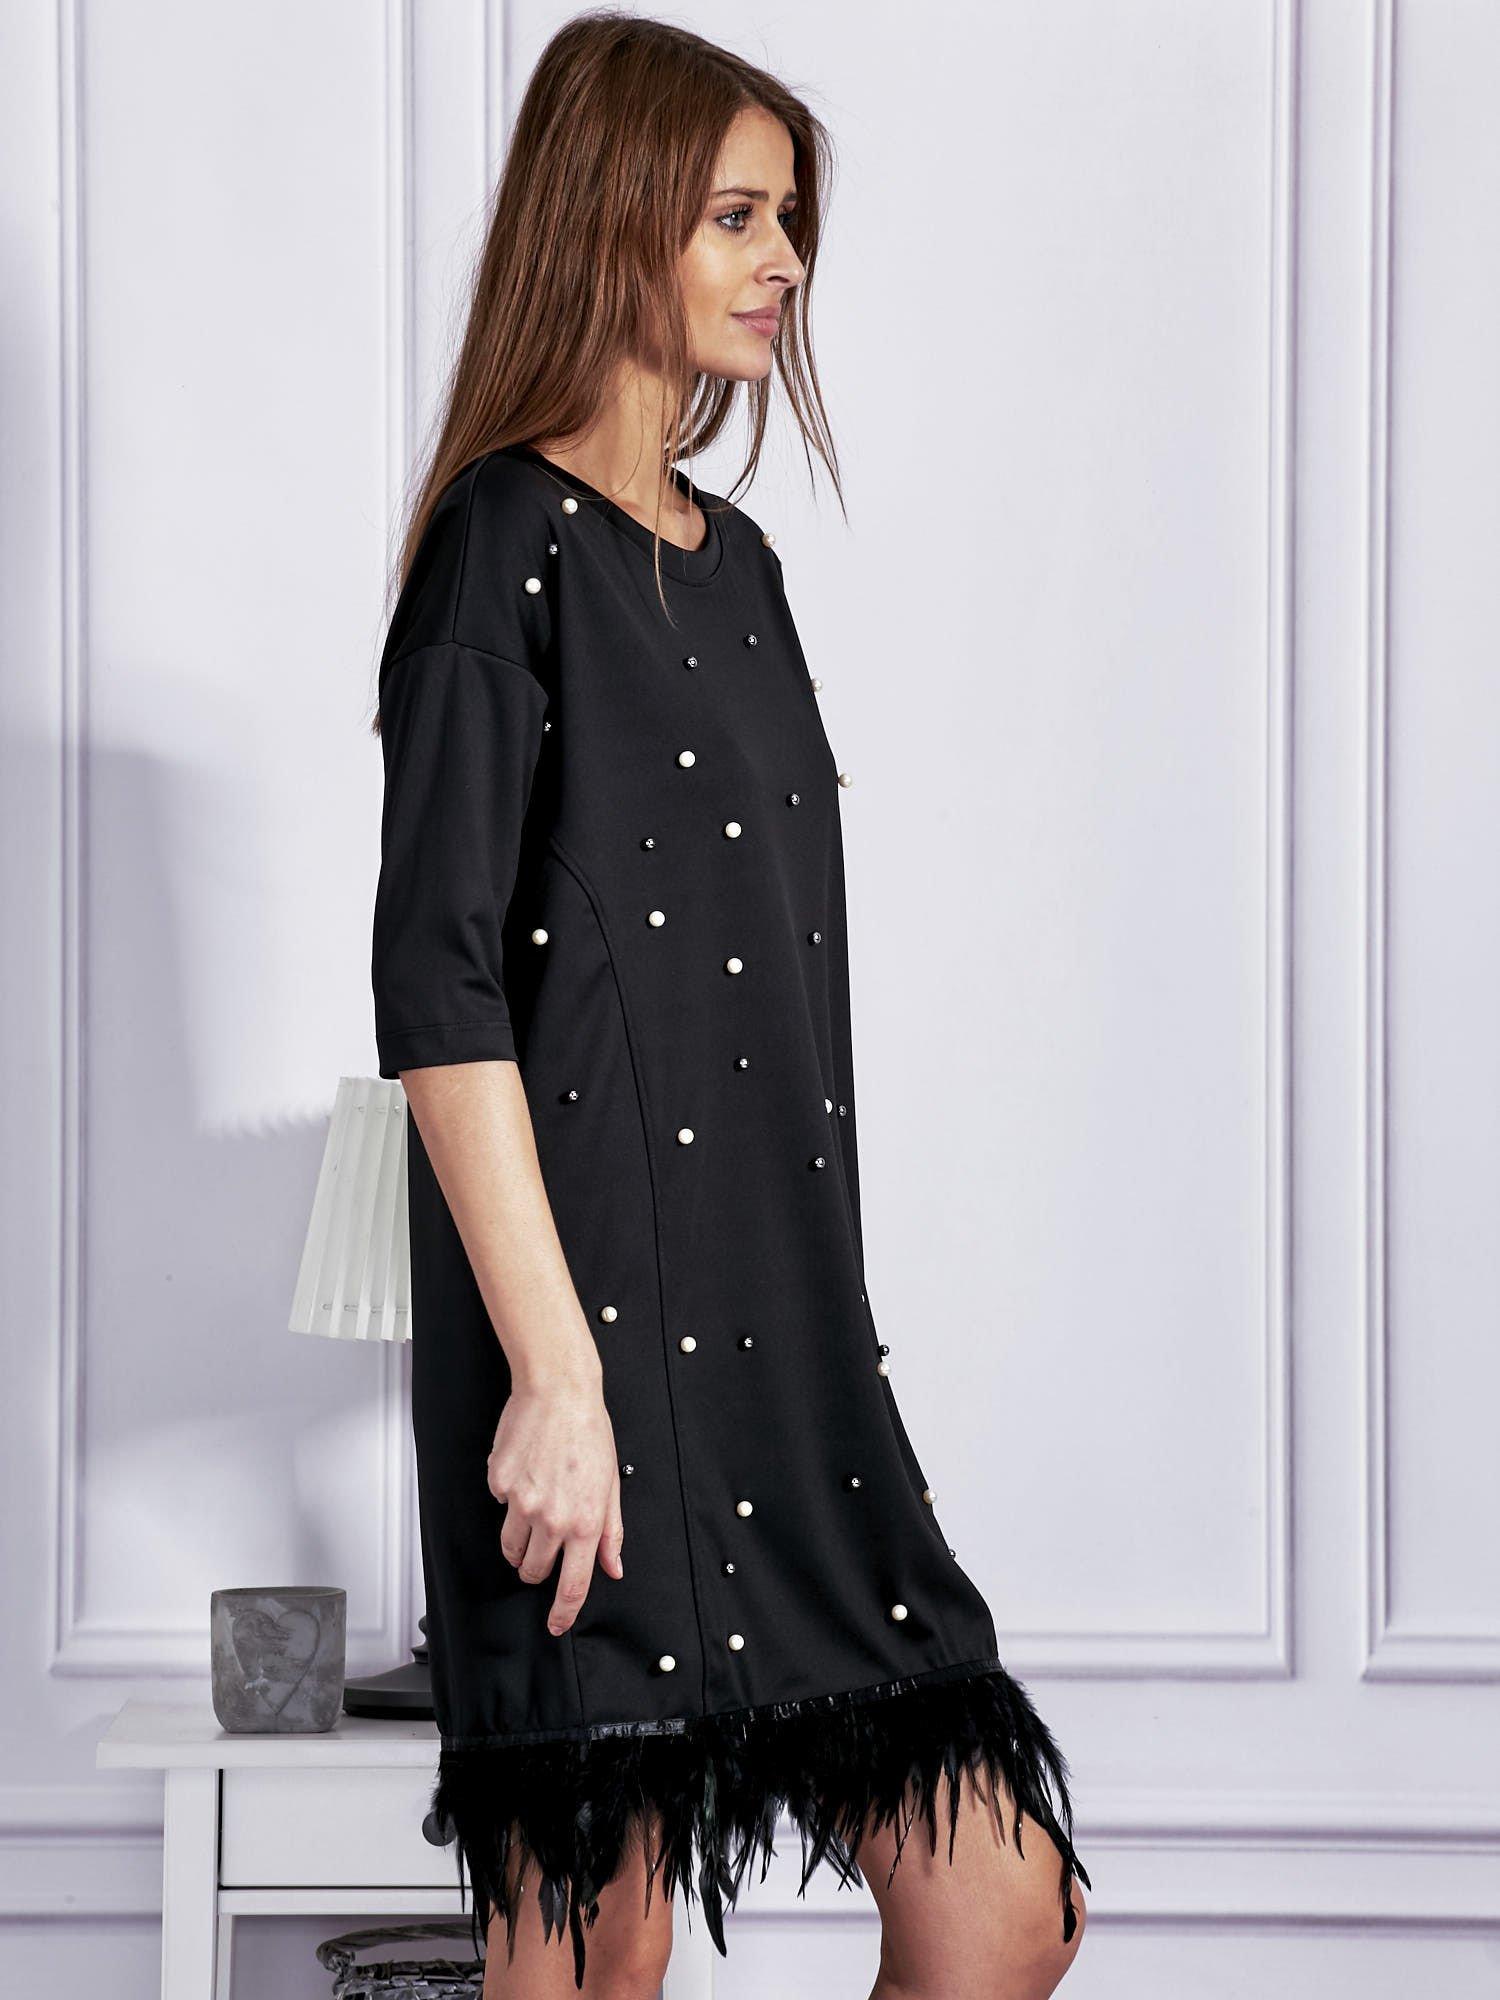 6f23f4bb0e70d0 Sukienka z perełkami i piórami na dole czarna - Sukienka koktajlowa ...